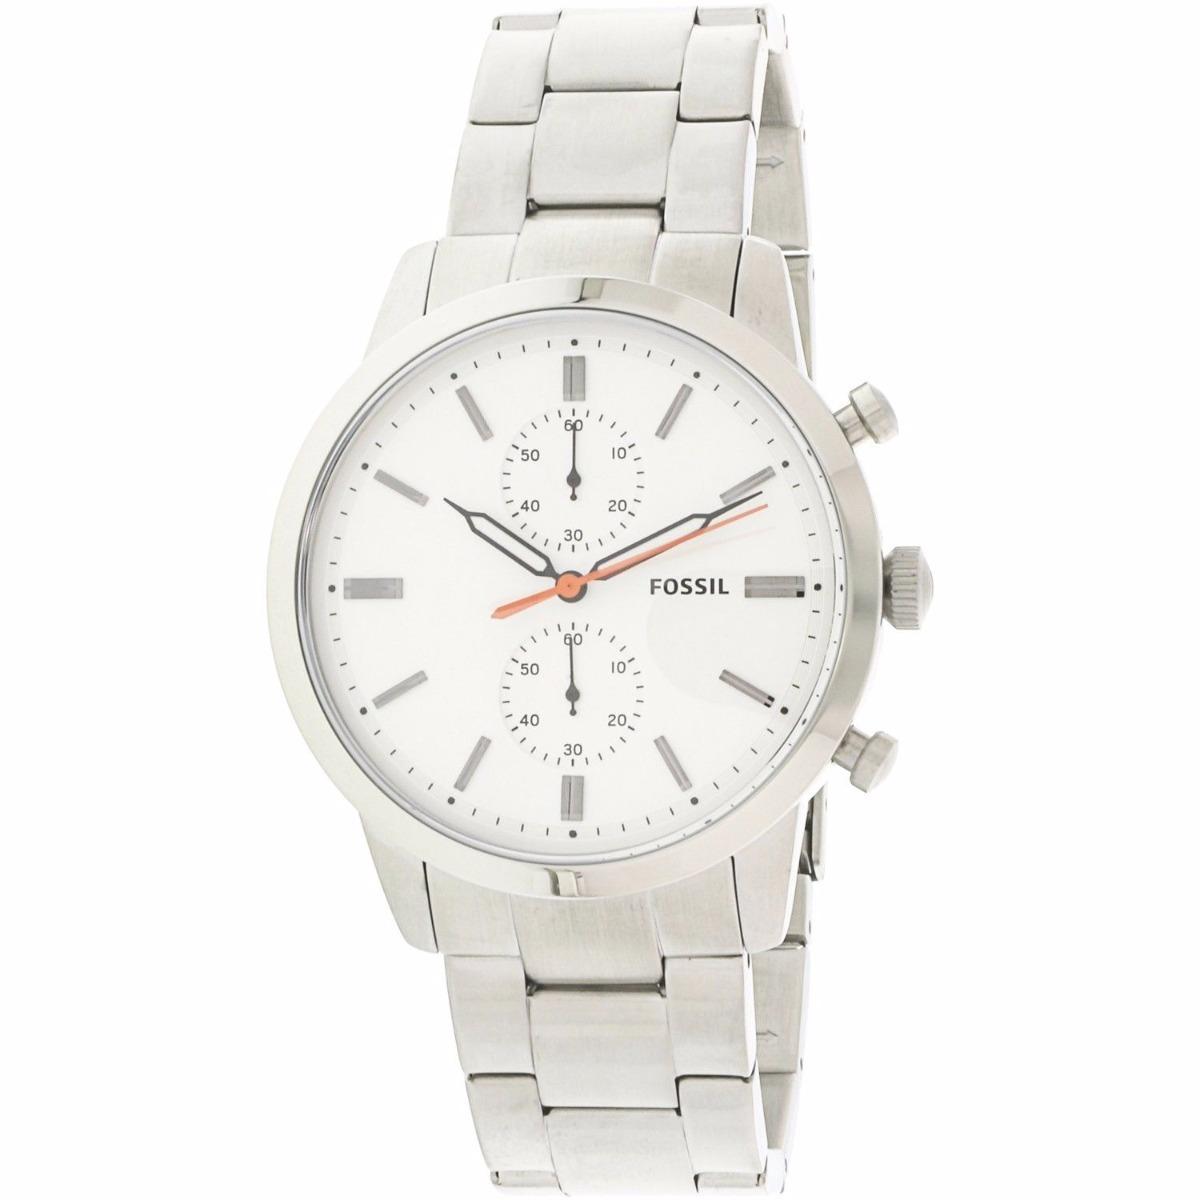 6ee335611 lindo relógio fossil masculino townsman fs5346 prata. Carregando zoom.